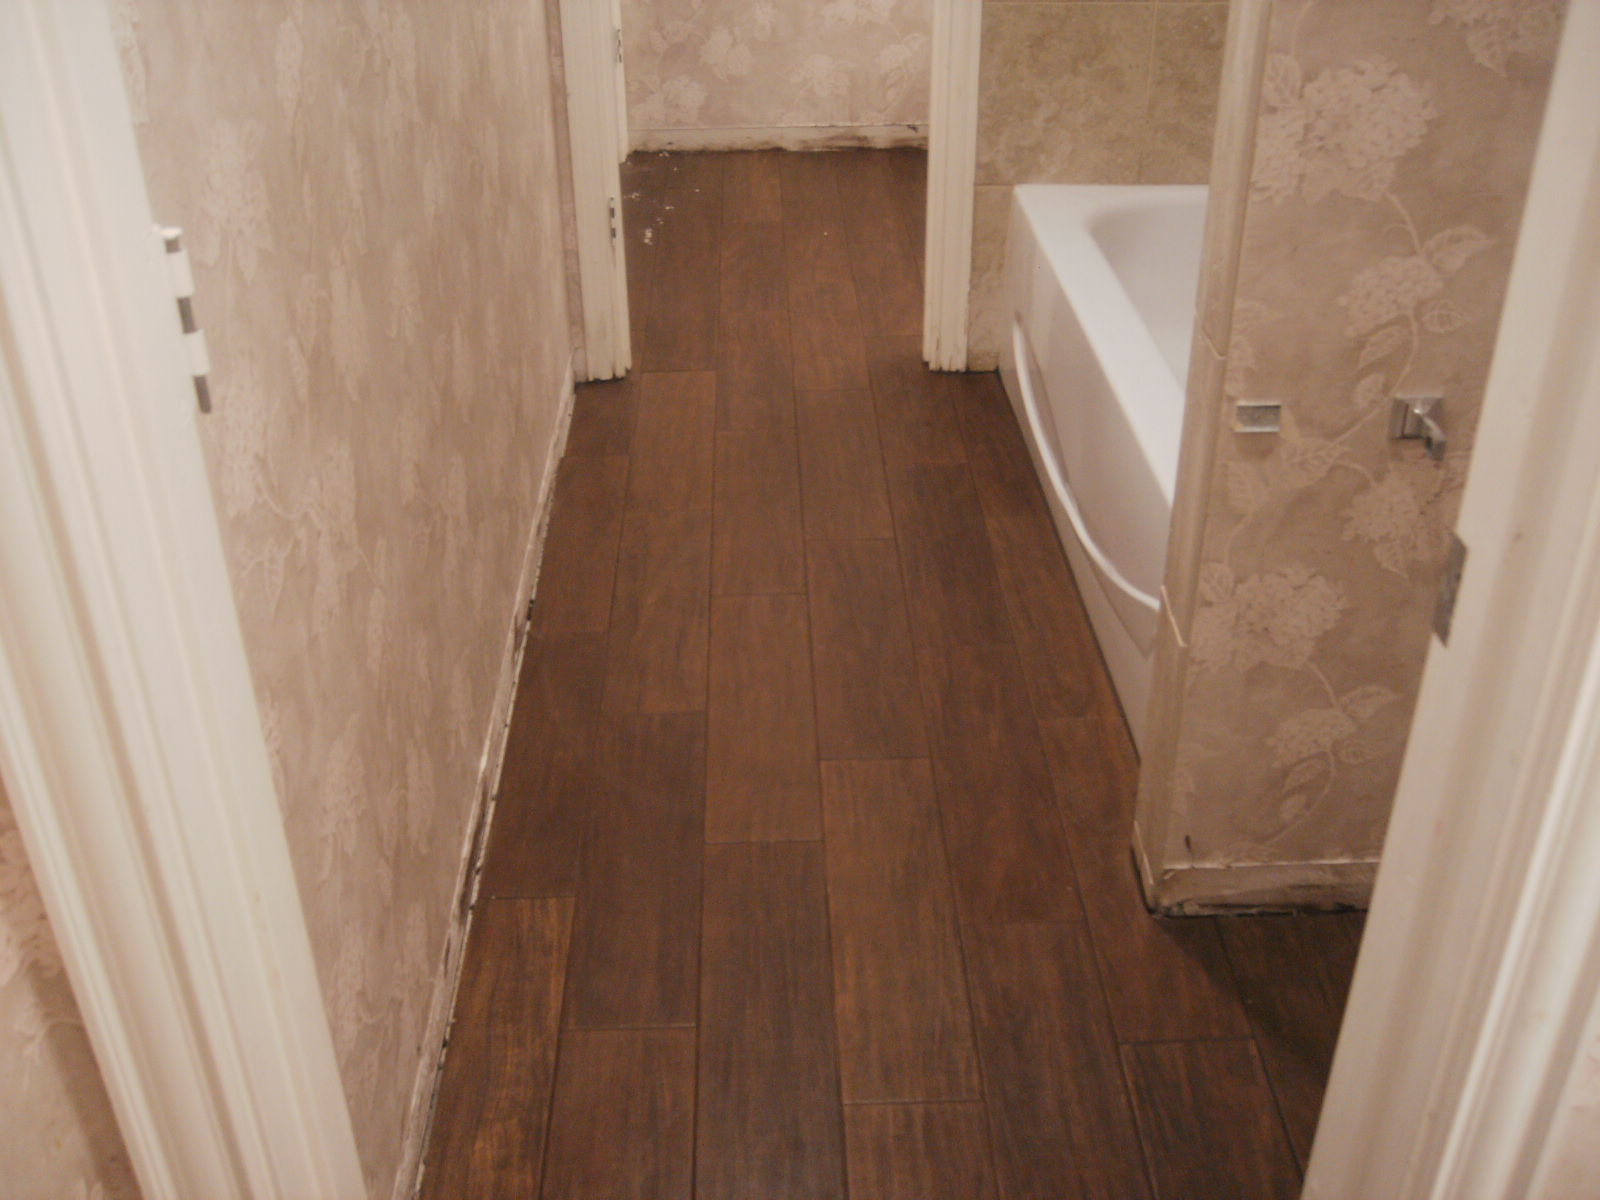 Best bathroom tile confessions of a tile setter best bathroom tile dailygadgetfo Images